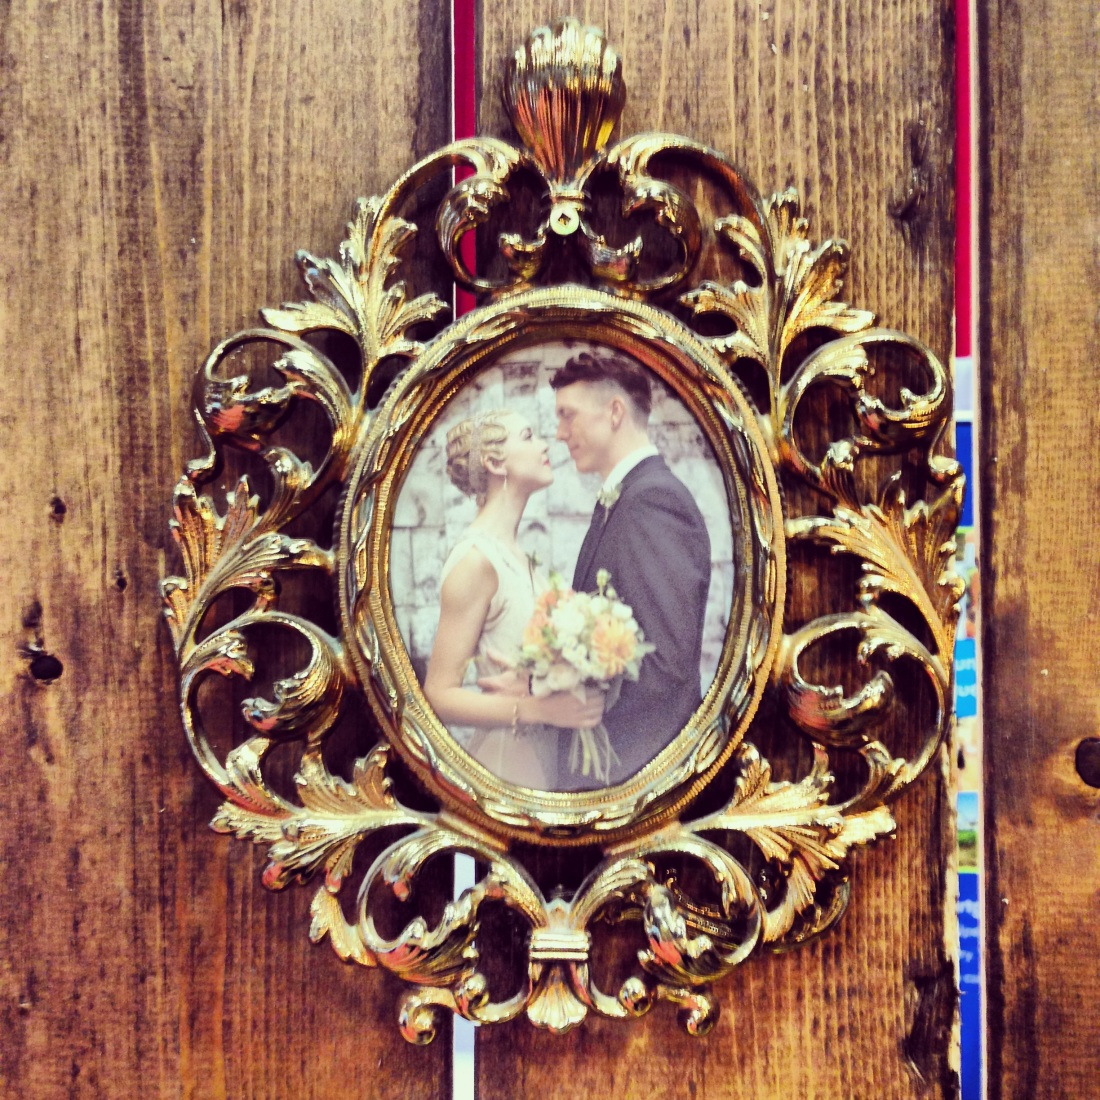 brass vintage frame with wedding photo